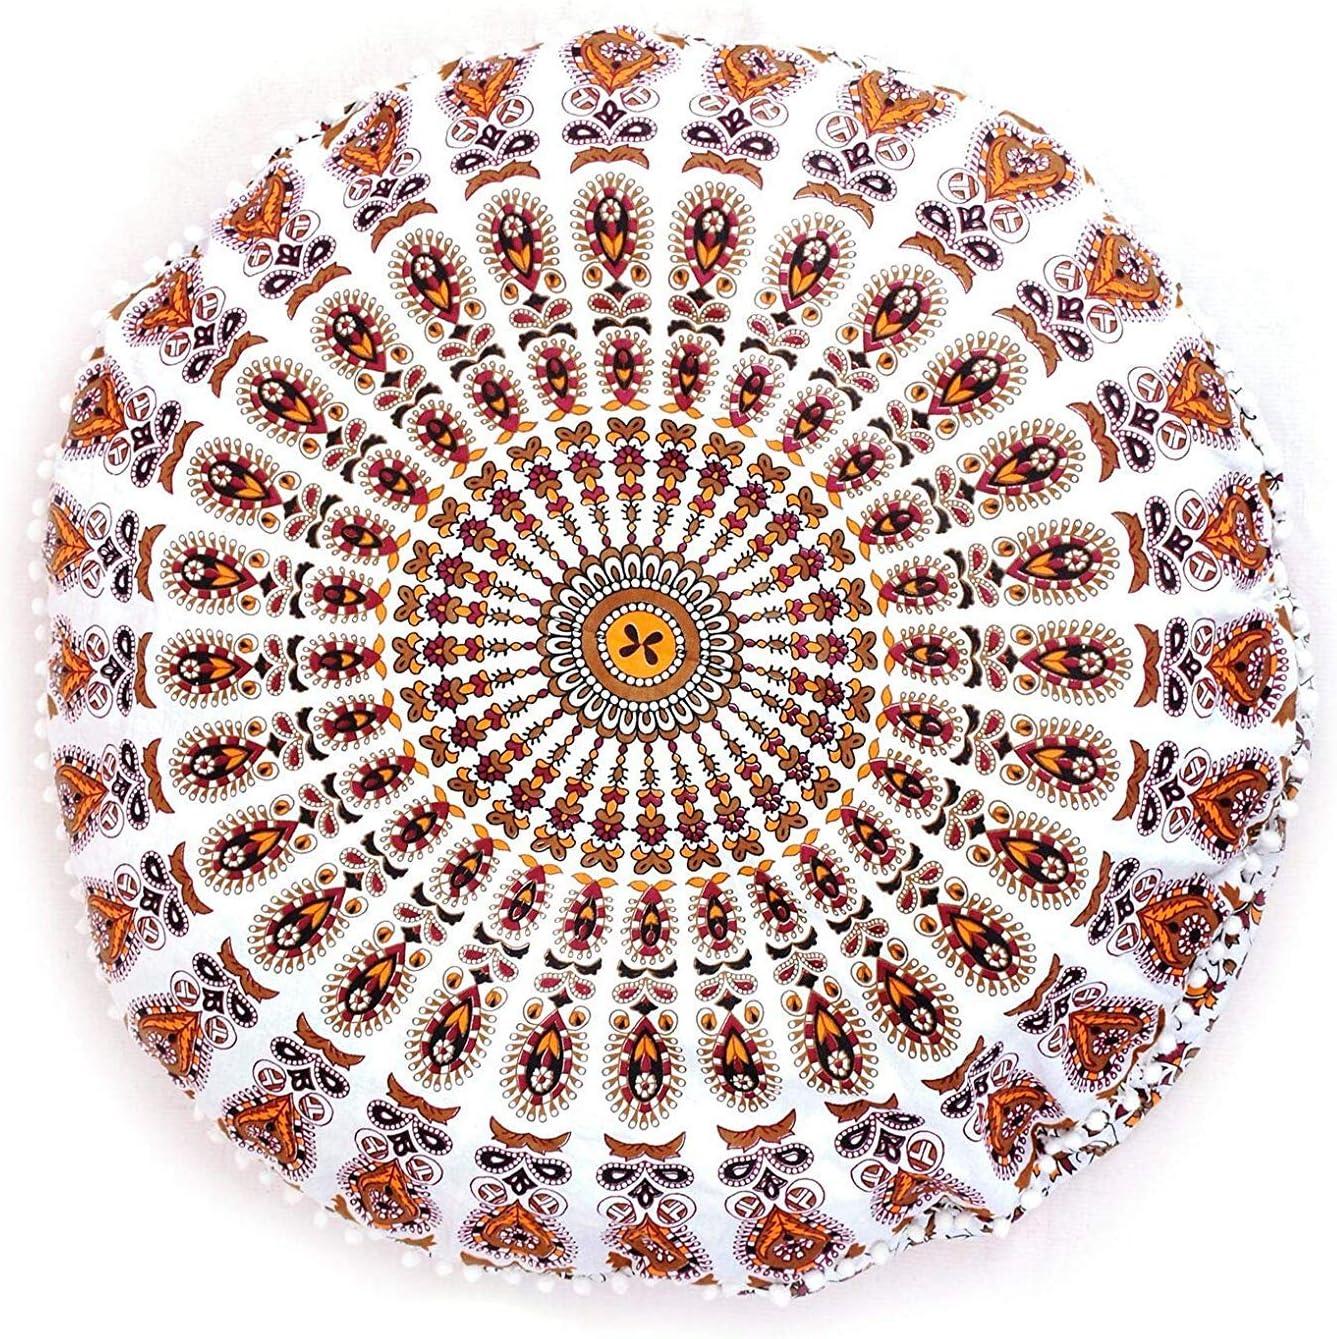 Psychedelic Horoscope Astrology Zodiac Sign Pouf Tie Dye Boho Indian Large Shams Celestial Virgo Sun Moon Stars Symbol Modern Floor Pillows Cushion Seating Throw Cover Decor Round Meditation Ottoman